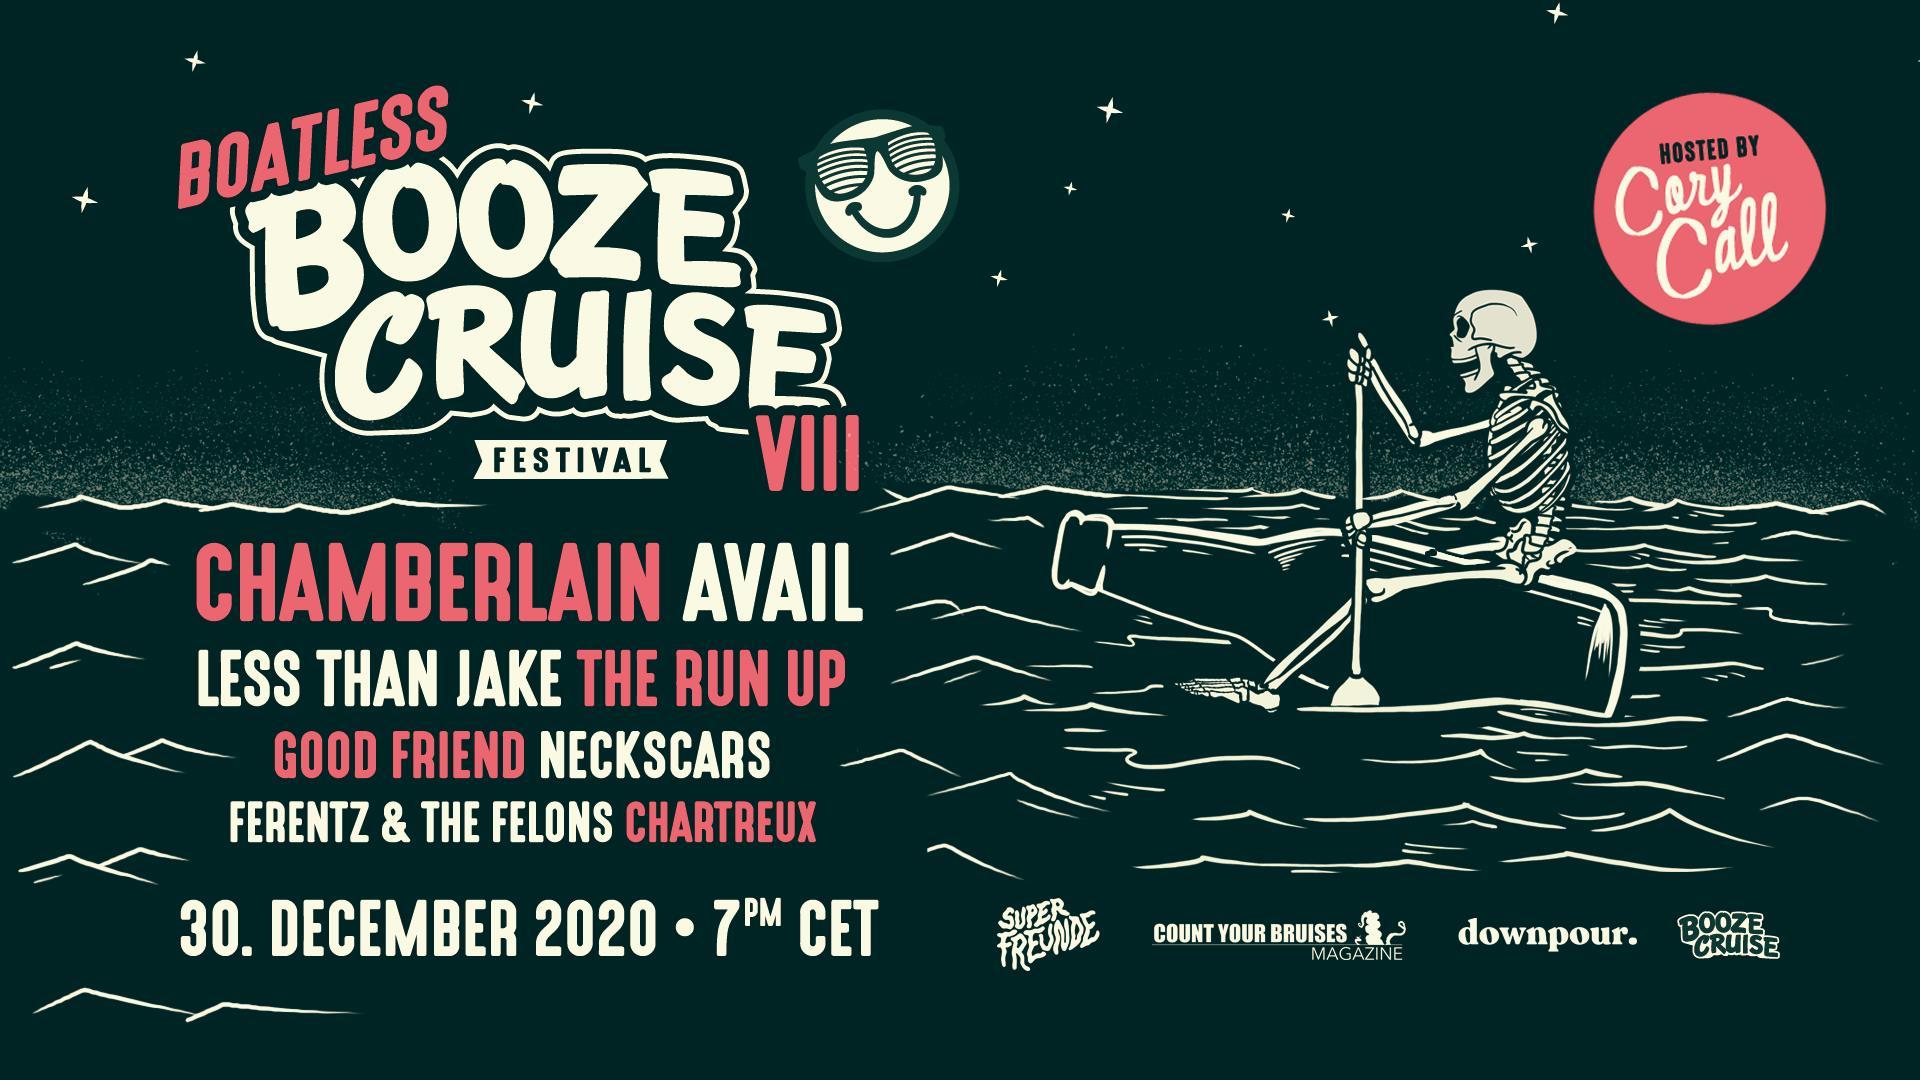 Boatless Booze Cruise Festival